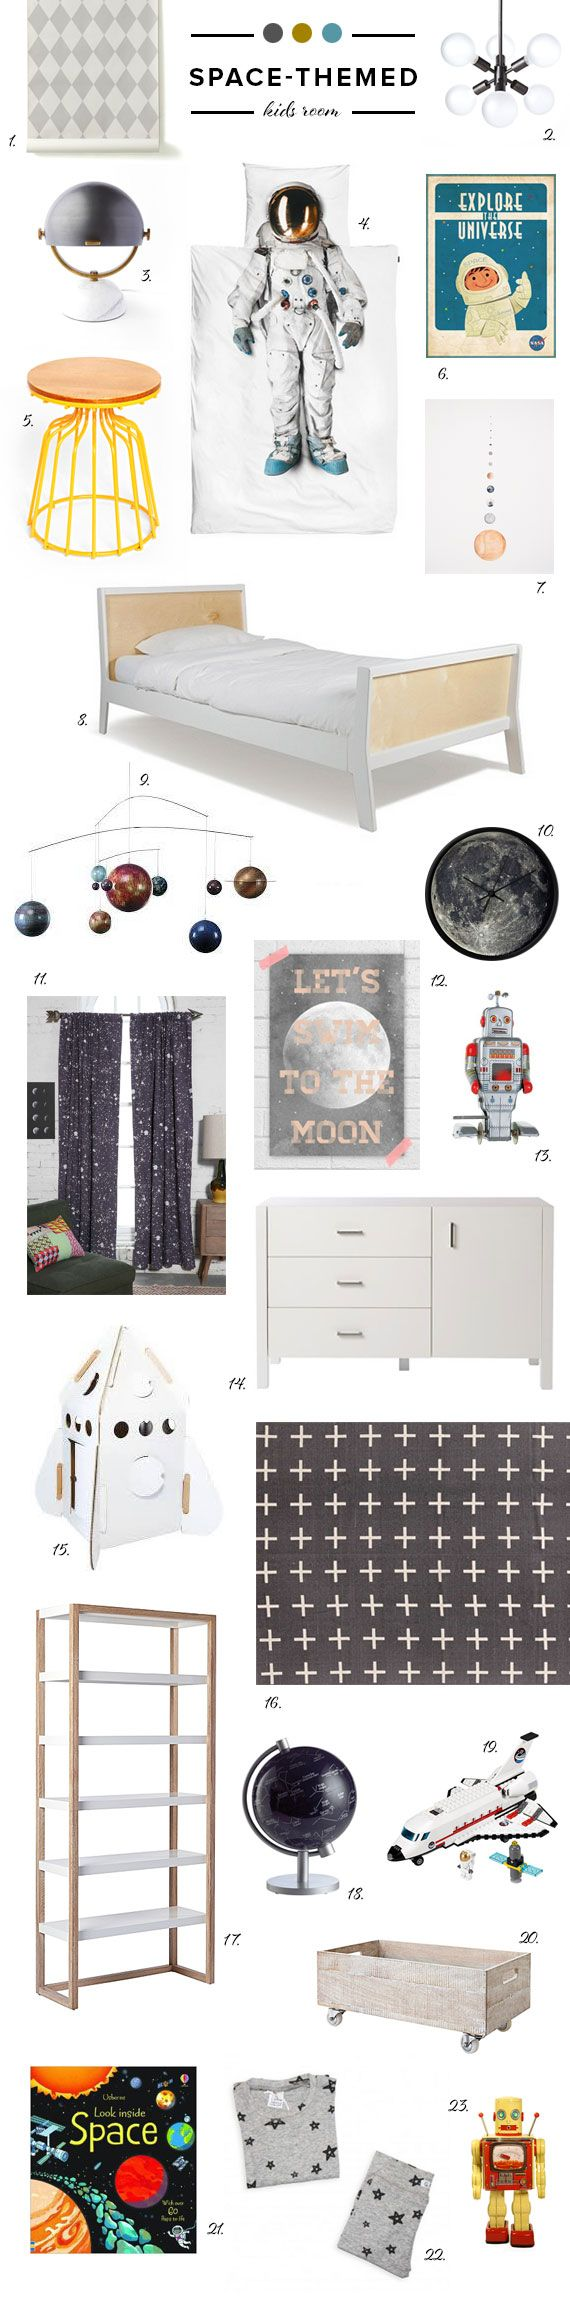 Space-themed kids room ideas | John O. | Pinterest | Kinderzimmer ...